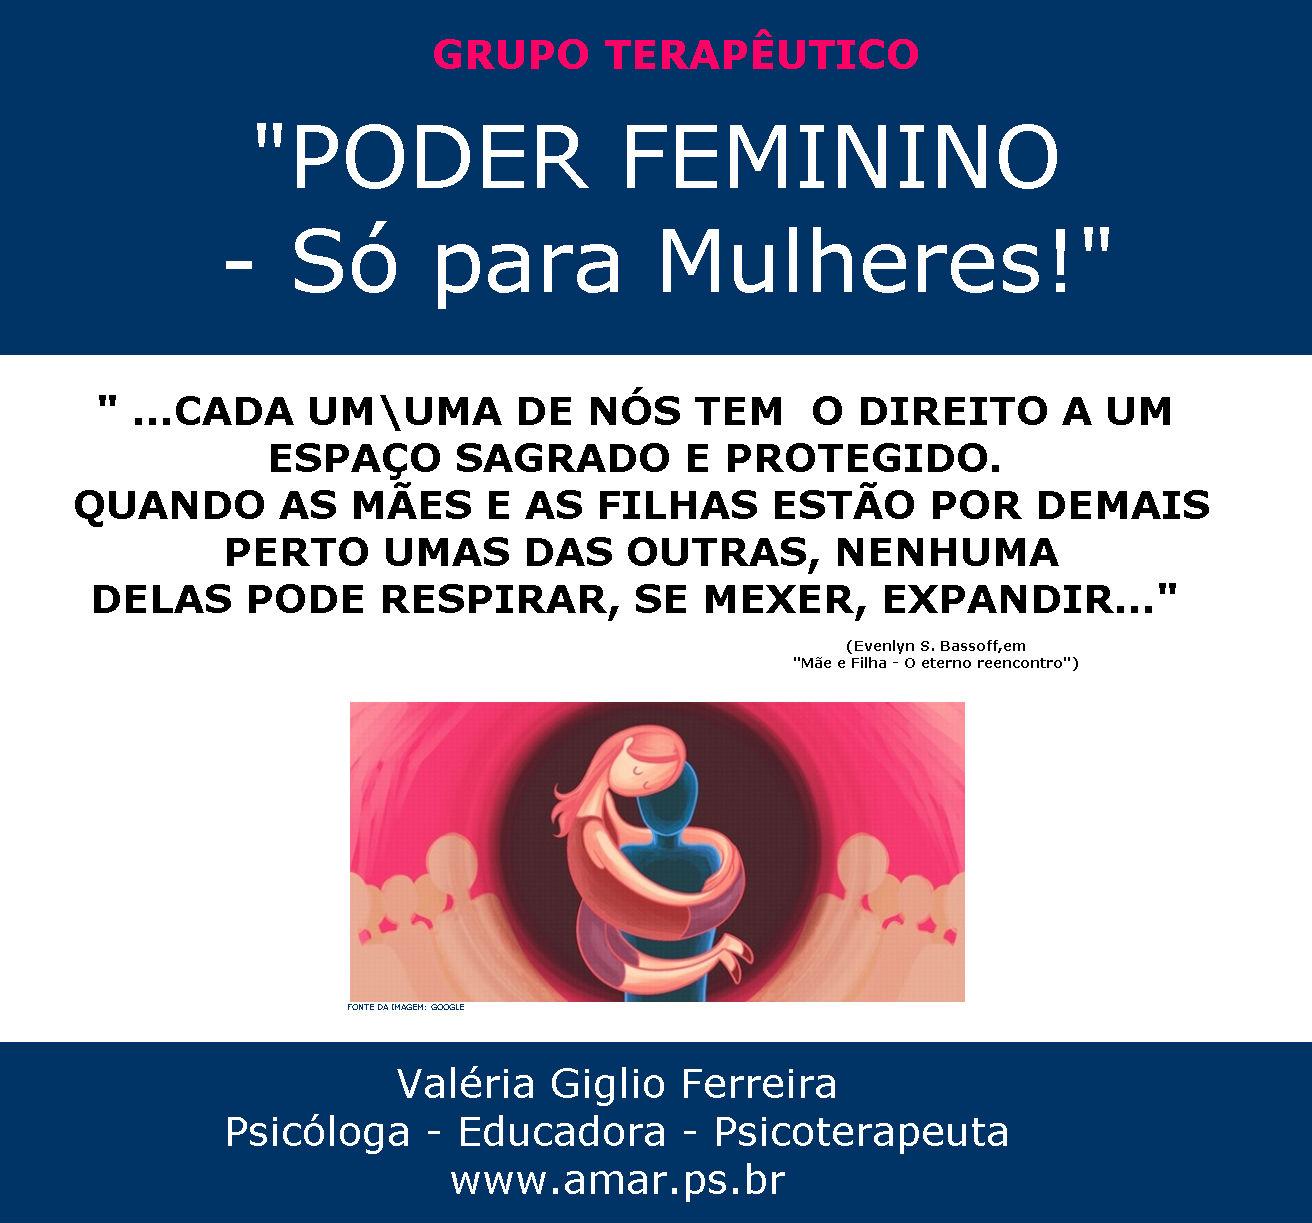 GRUPO TERAPÊUTICO - PODER FEMININO - Só para Mulheres!